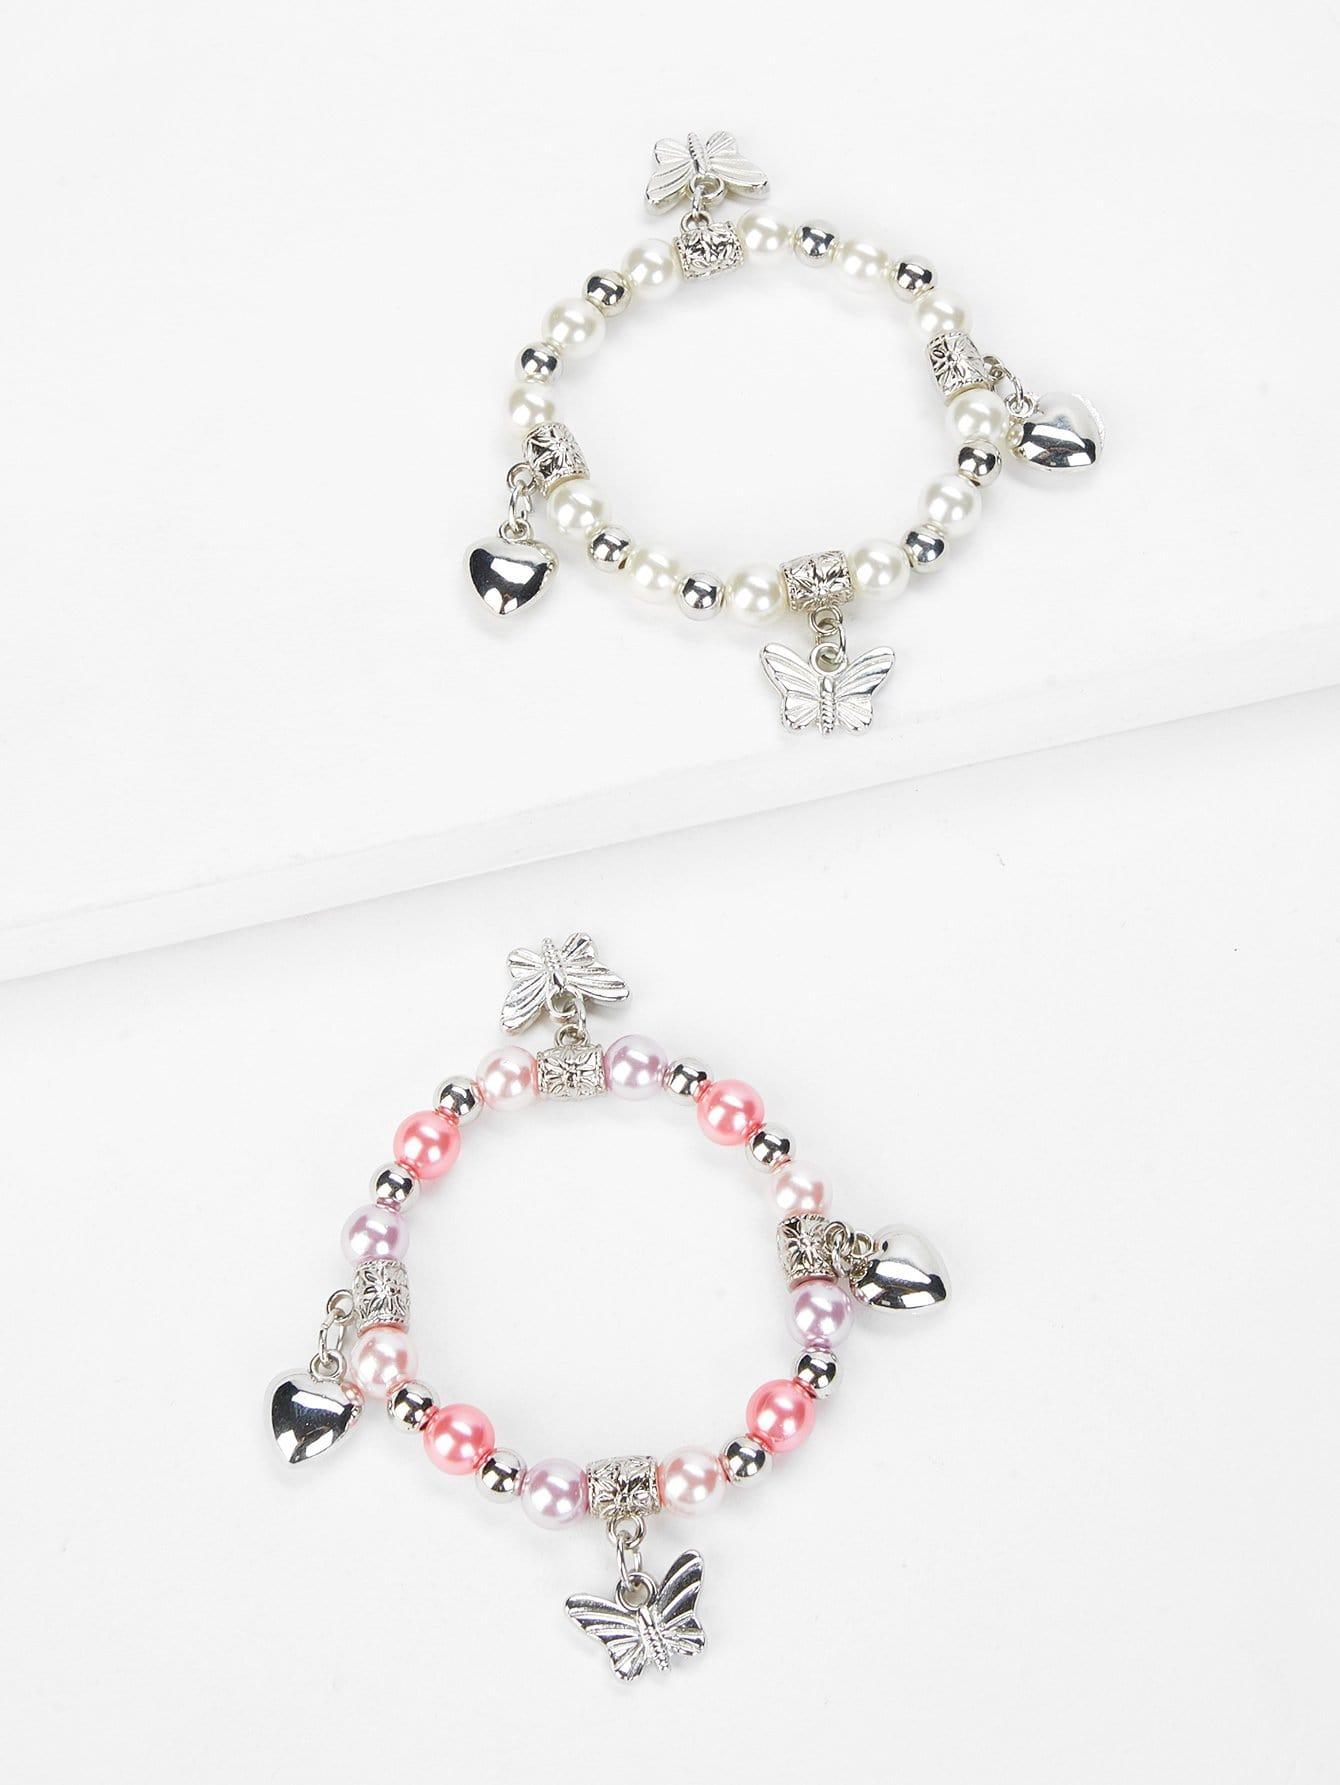 Heart Charm Beaded Bracelet dull polished mixed beaded bracelet